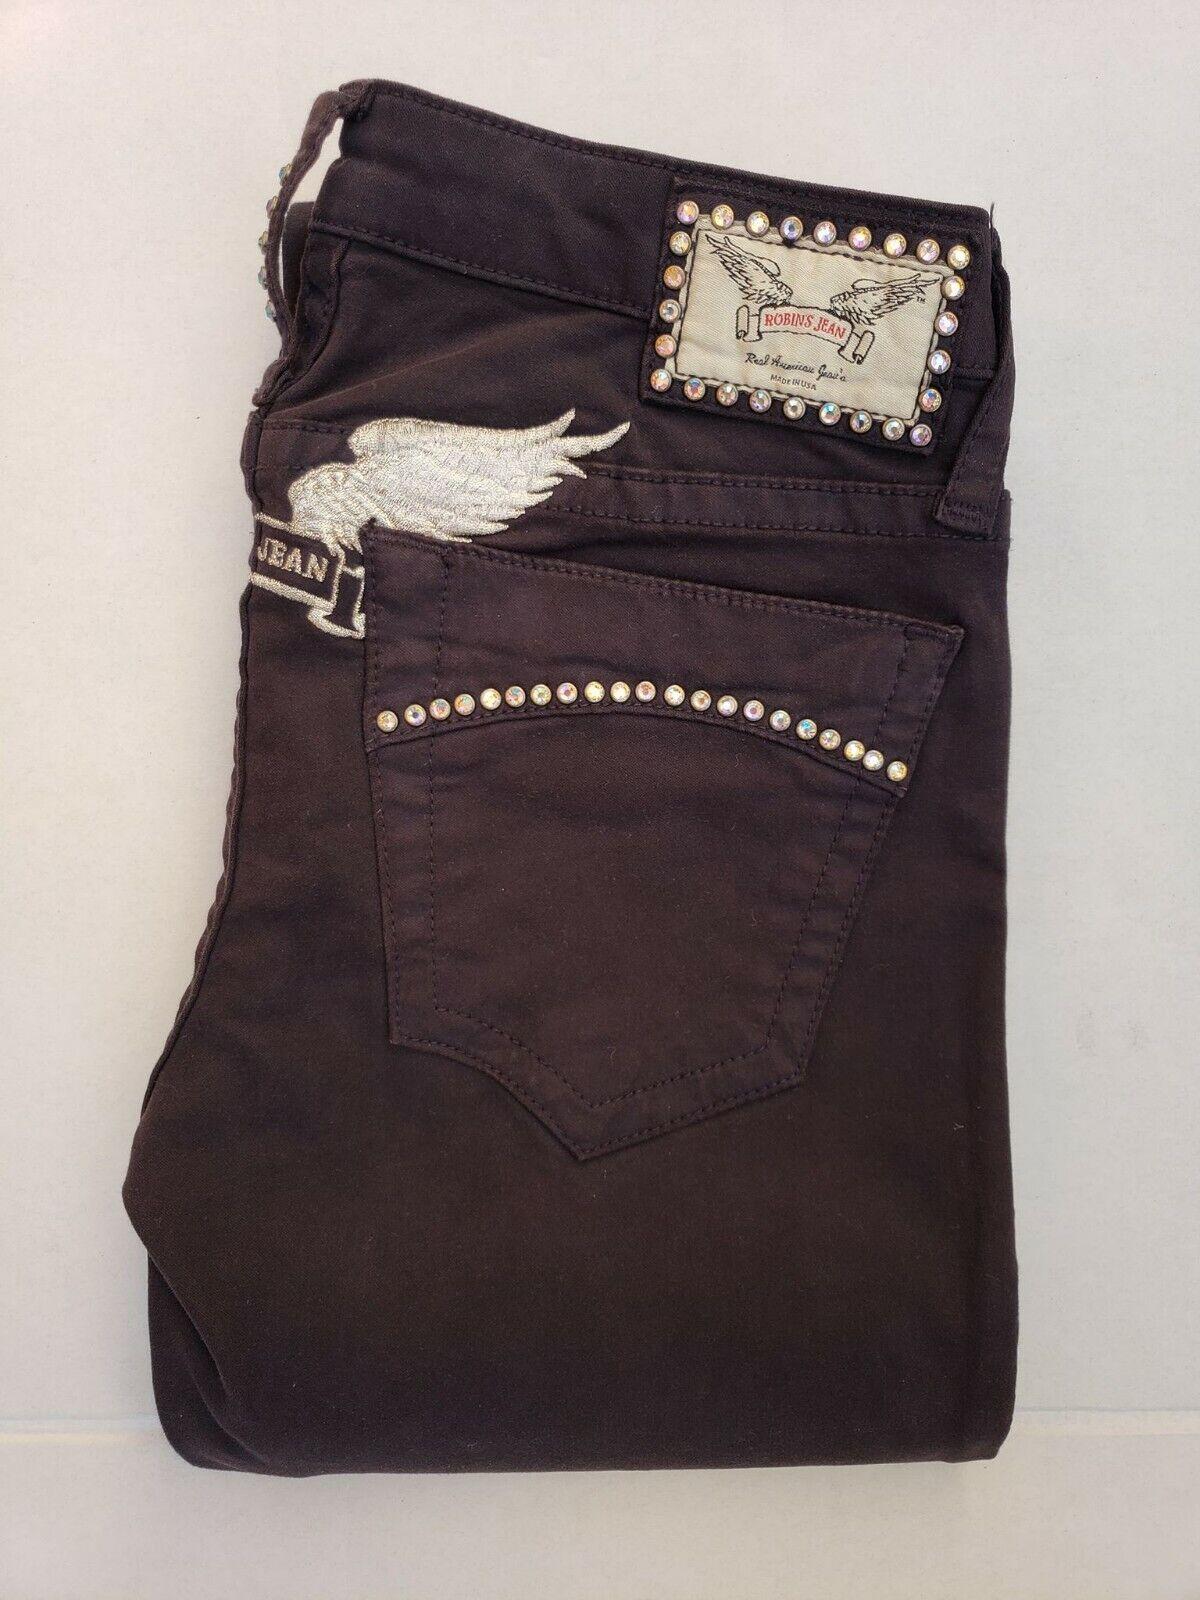 New Women's ROBIN'S JEAN sz 25 Marilyn Straight Leg Jeans - Clear Crystals